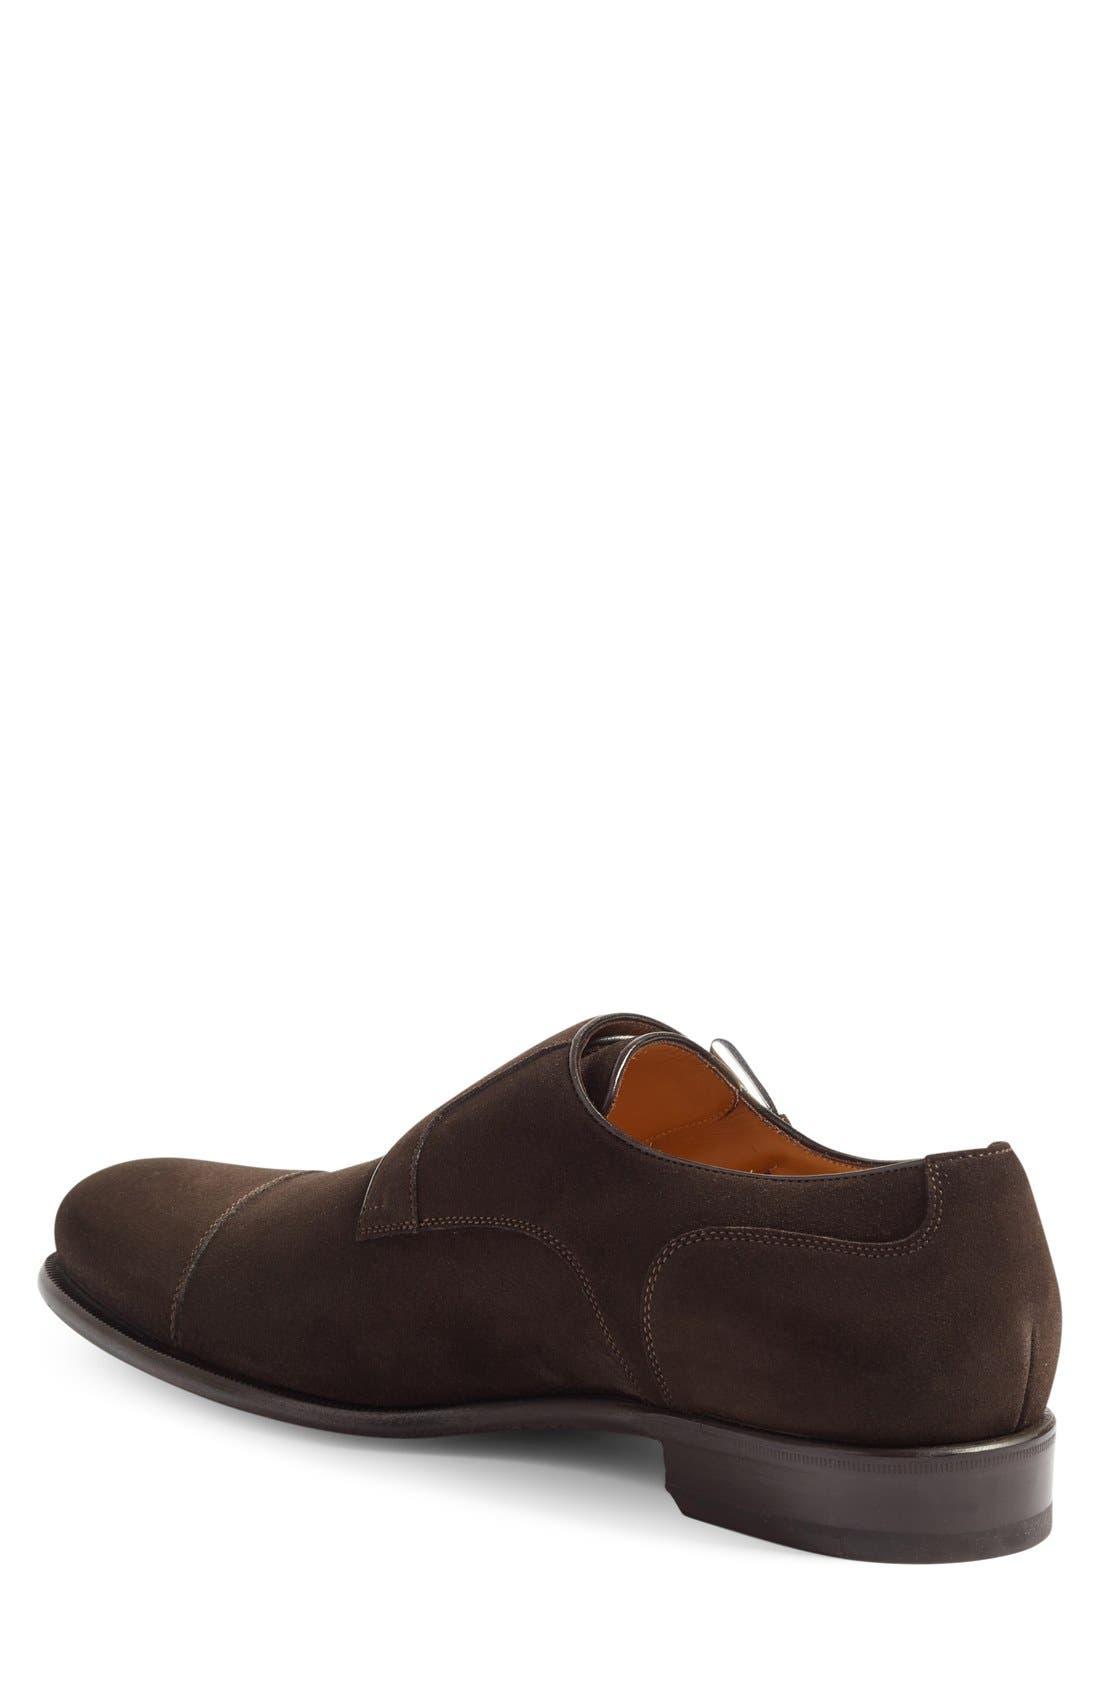 Double Monk Strap Shoe,                             Alternate thumbnail 3, color,                             Dark Brown Suede